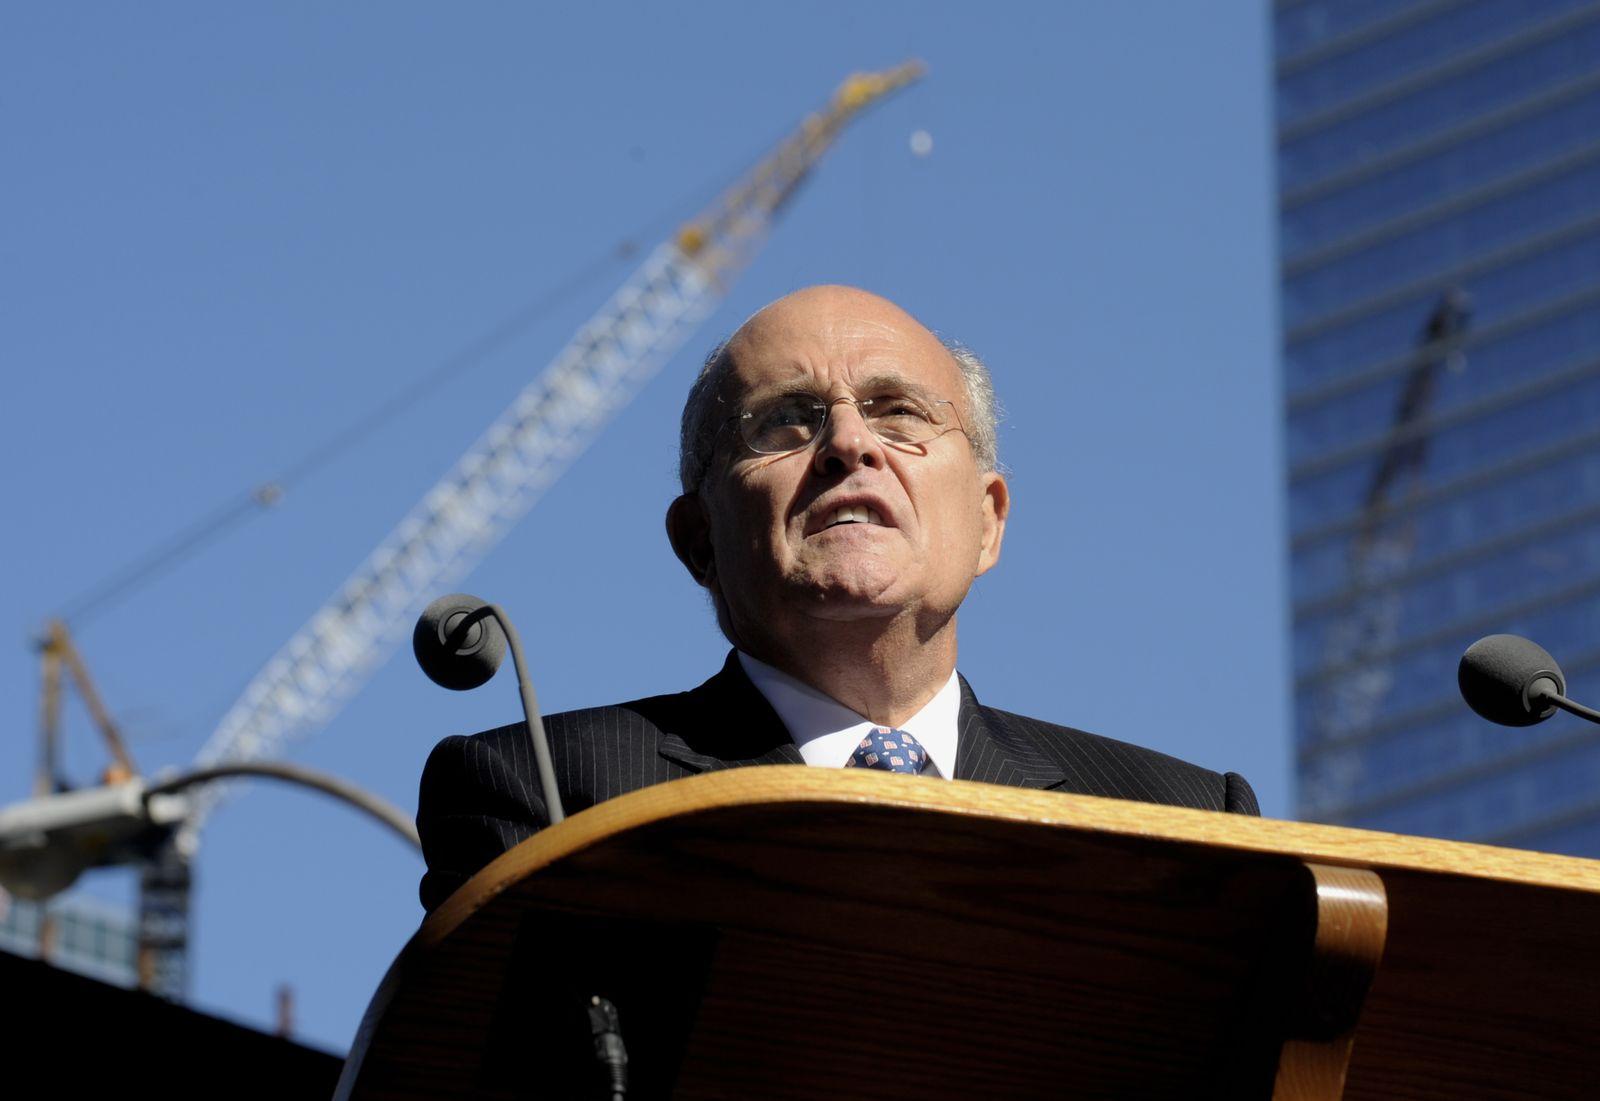 Ground Zero / Jahrestag / Giuliani